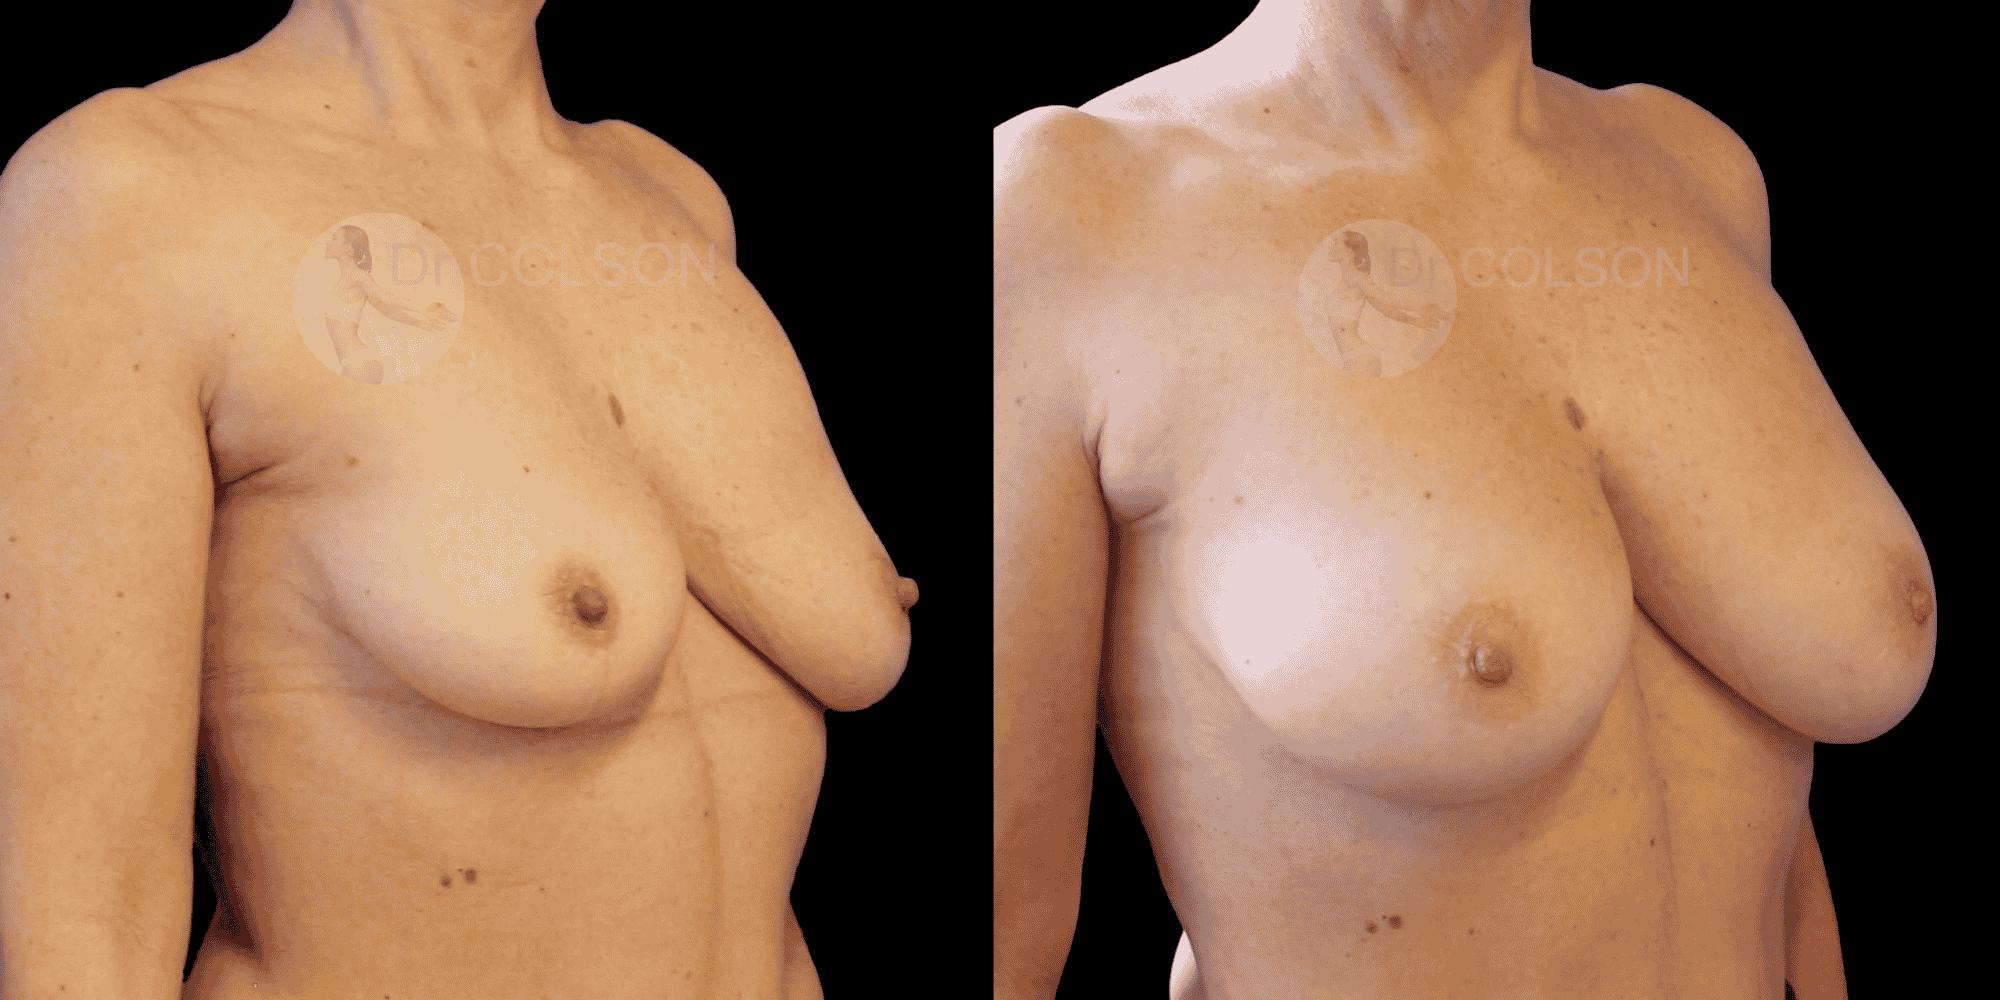 Dr Colson - Chirurgie sein - Lipofilling Mammaire Trois Quart